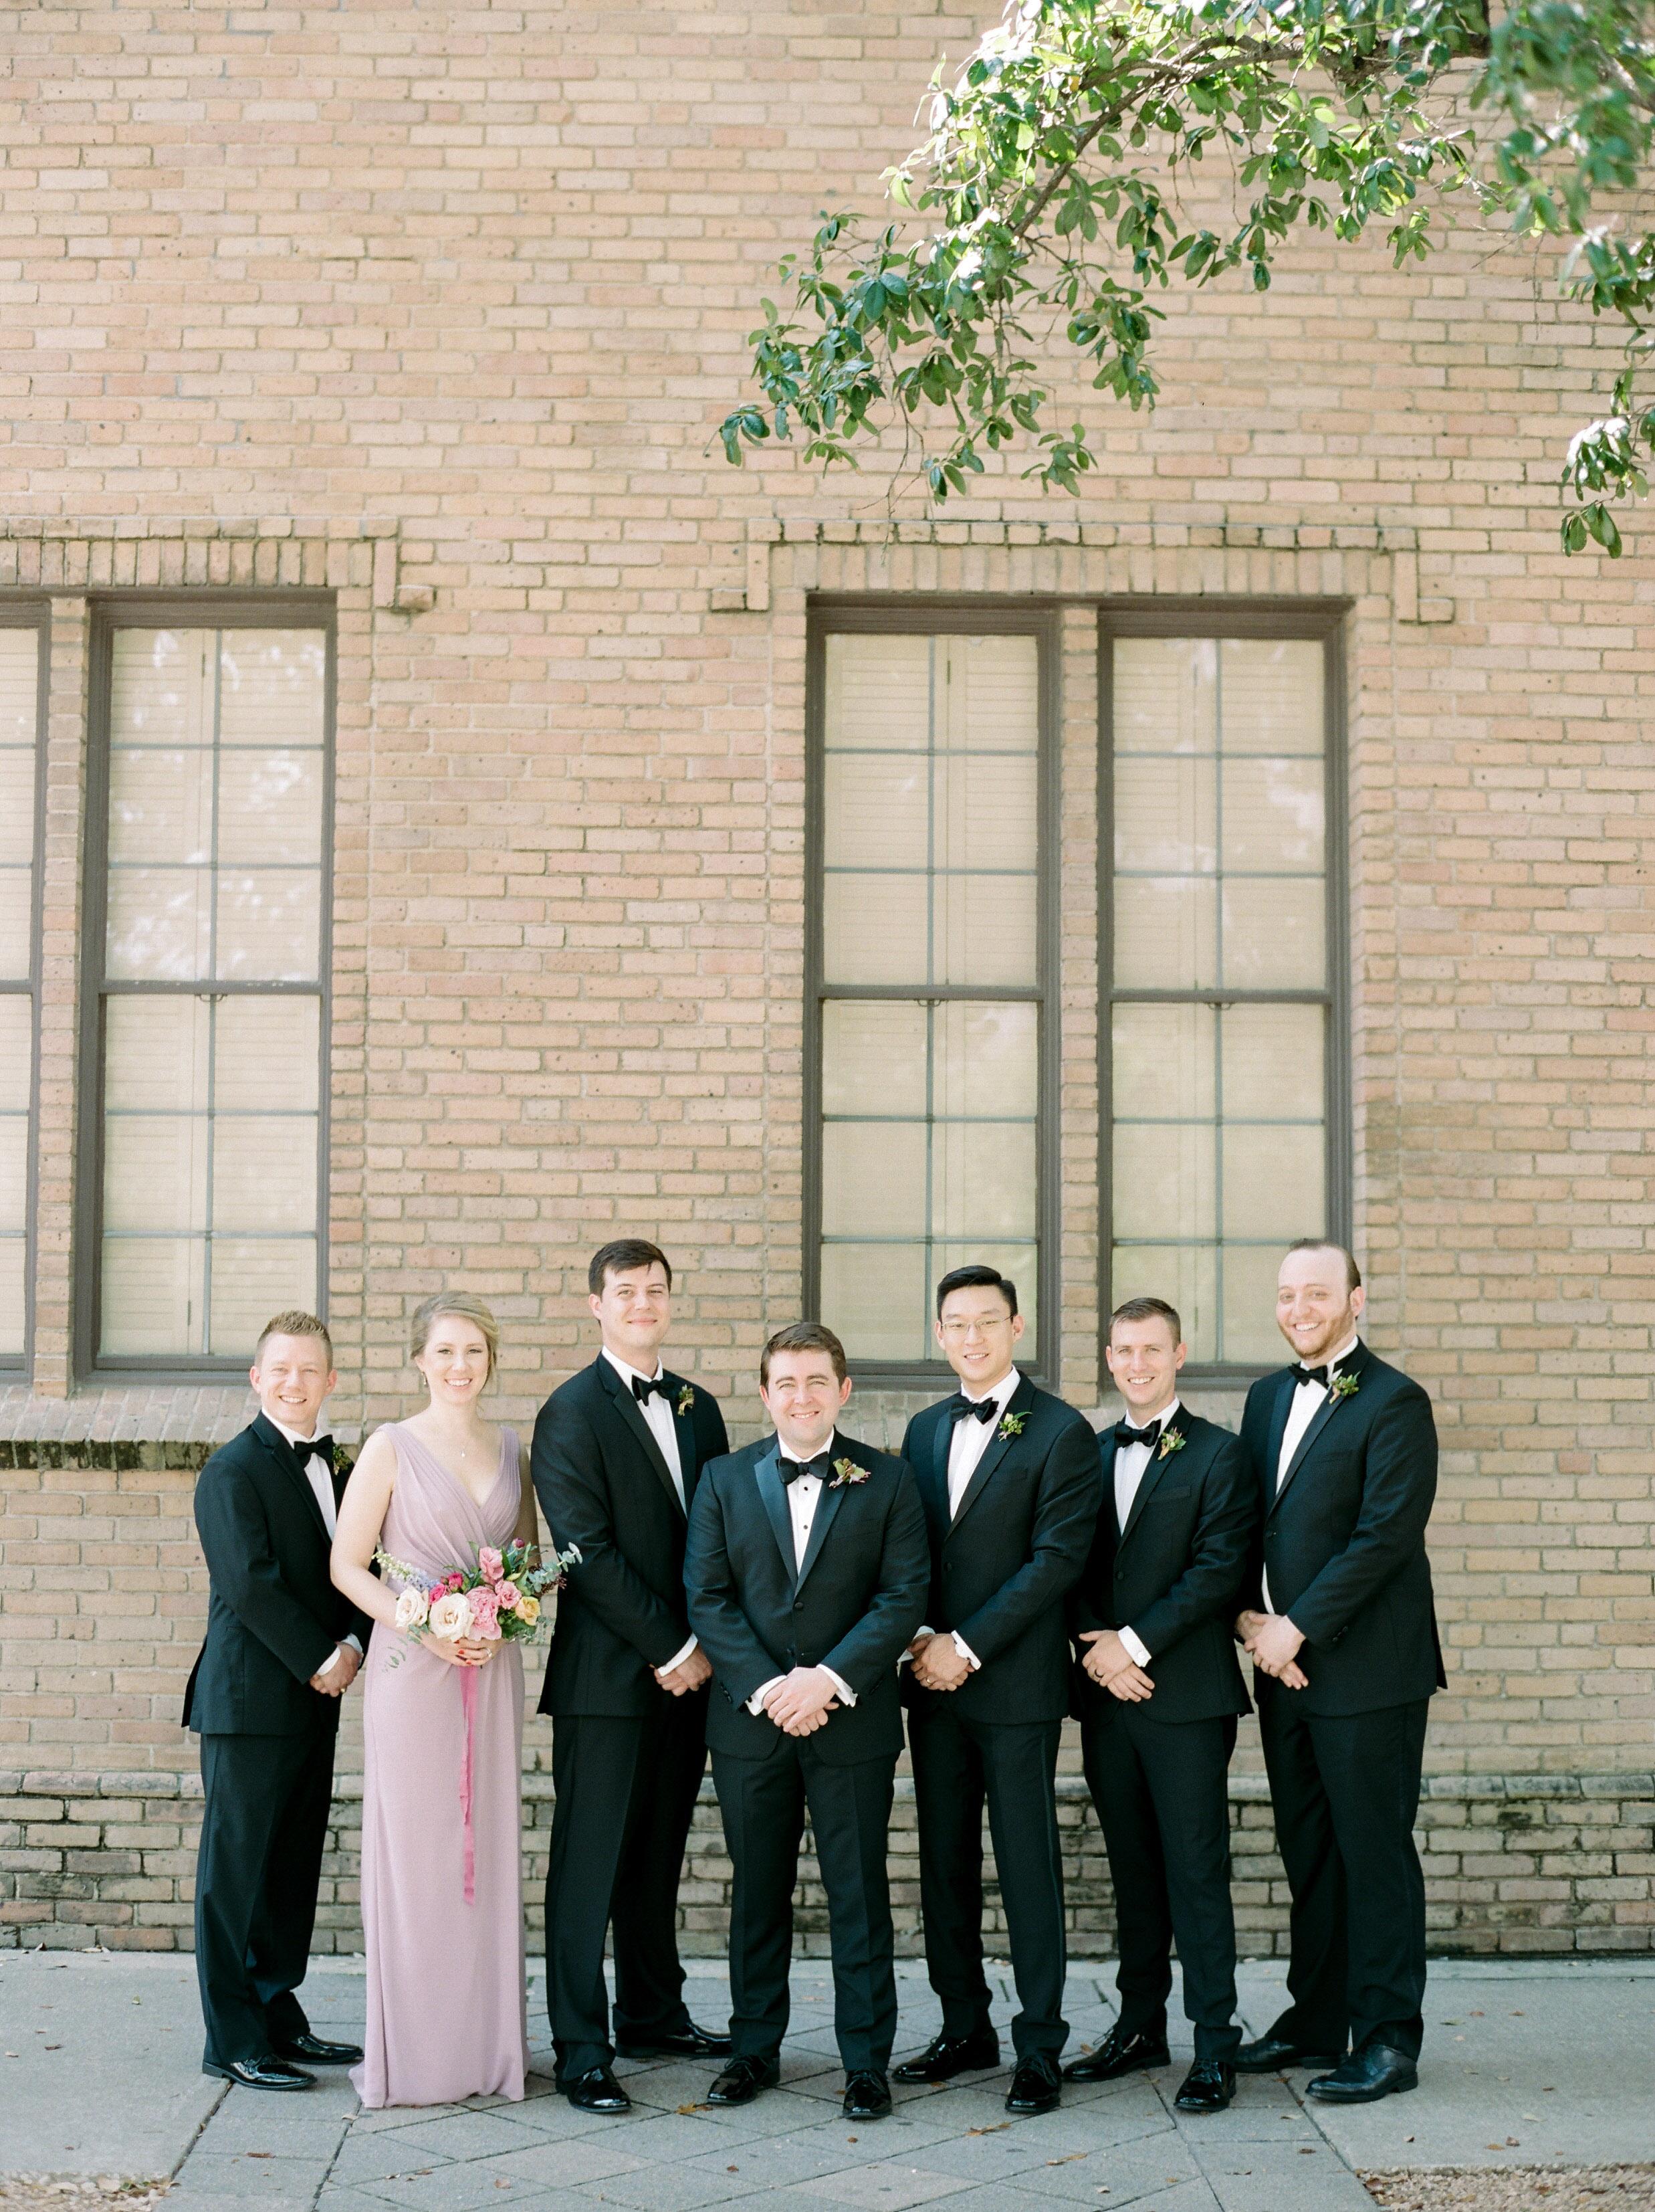 The-Knot-Texas-Fine-Art-Wedding-Film-Destination-Photographer-Houston-Austin-Dallas-New-Orleans-Julia-Ideson-Library-Event-Dana-Josh-Fernandez-Photograph-Top-Best-27.jpg